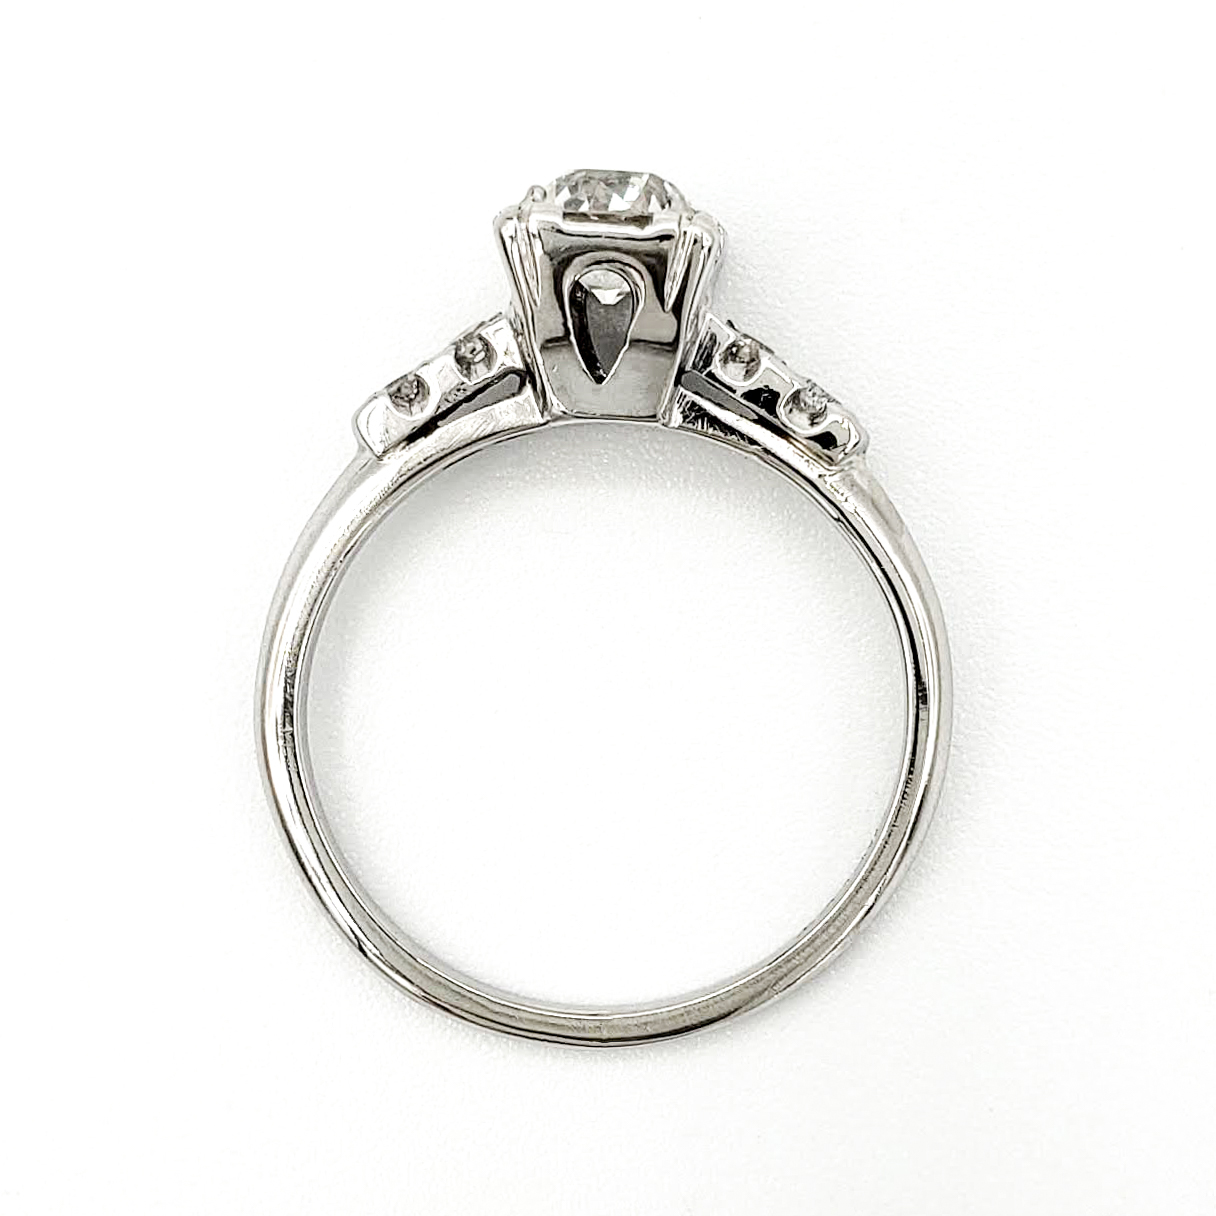 vintage-platinum-engagement-ring-with-0-51-carat-old-european-cut-diamond-egl-h-si1